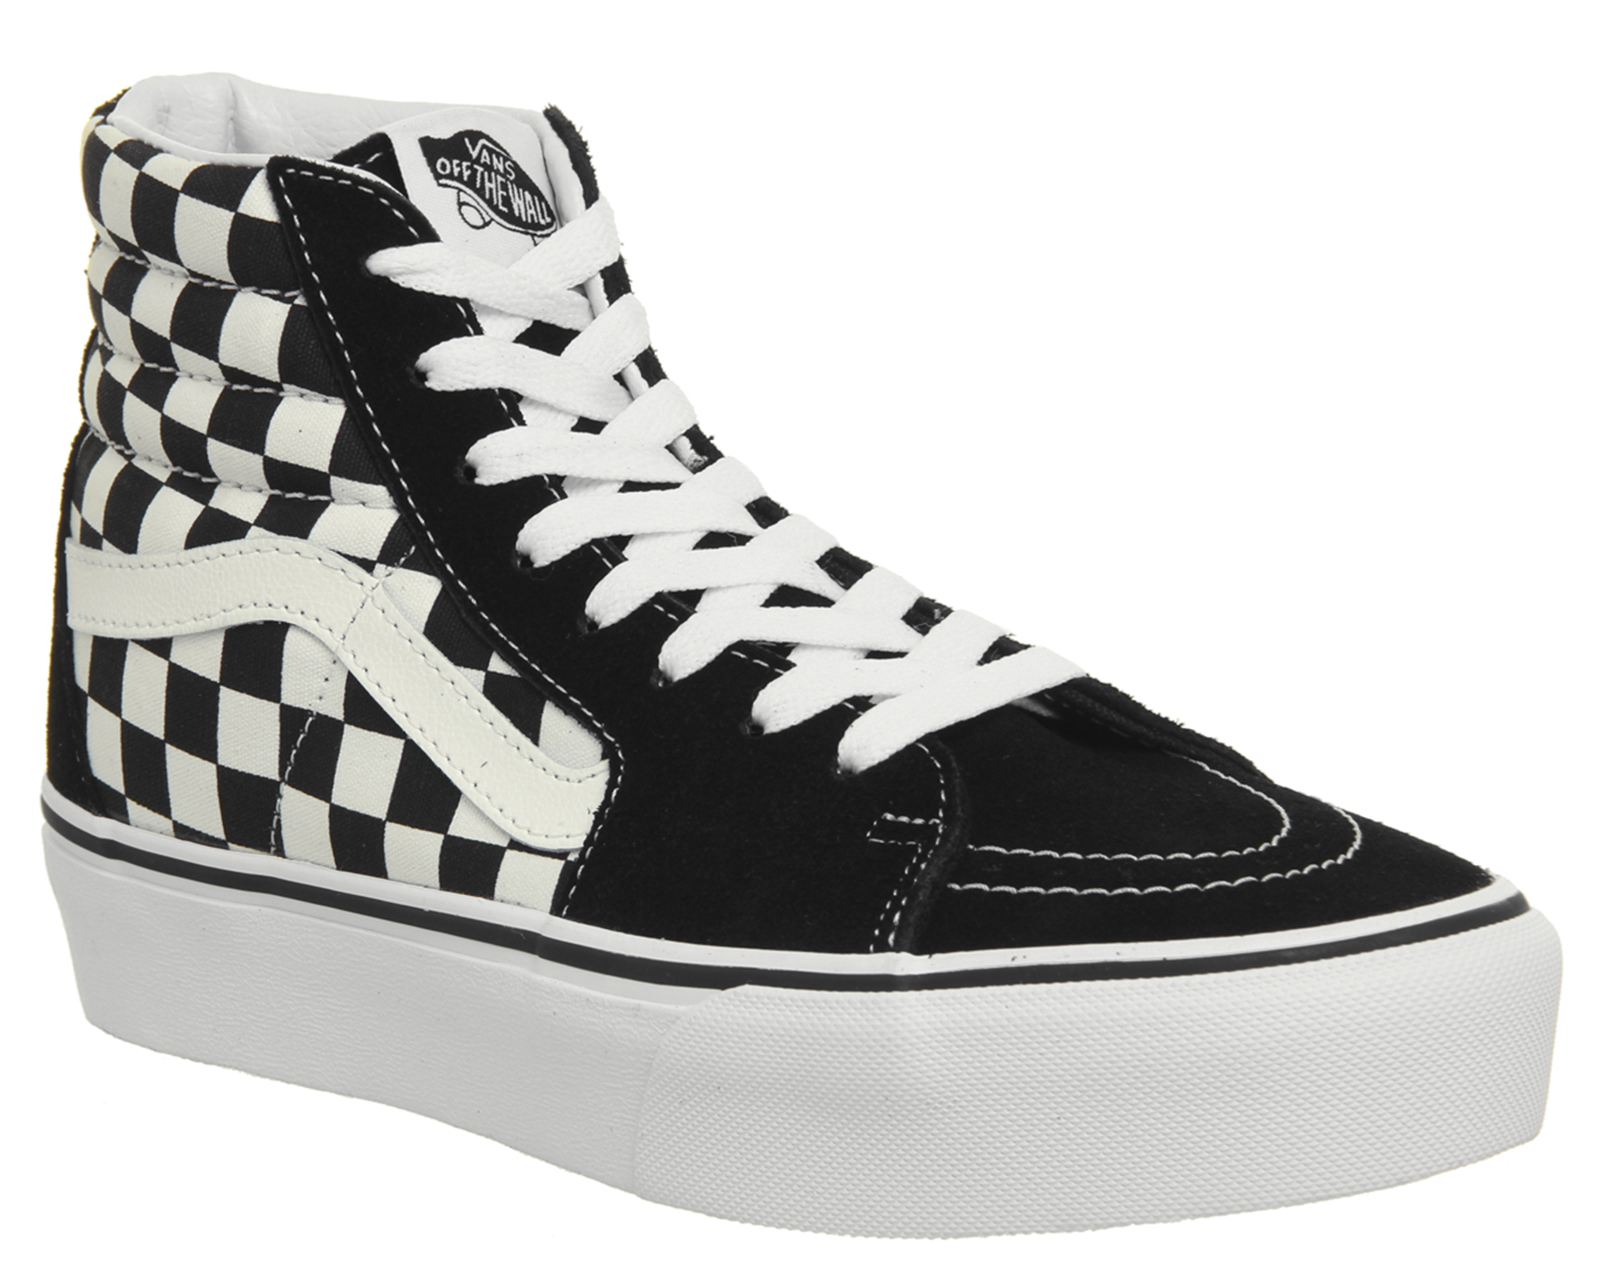 df8424bd82 Sentinel Womens Vans Sk8 Hi Platform 2.0 Trainers Black White Checkerboard  Trainers Shoes